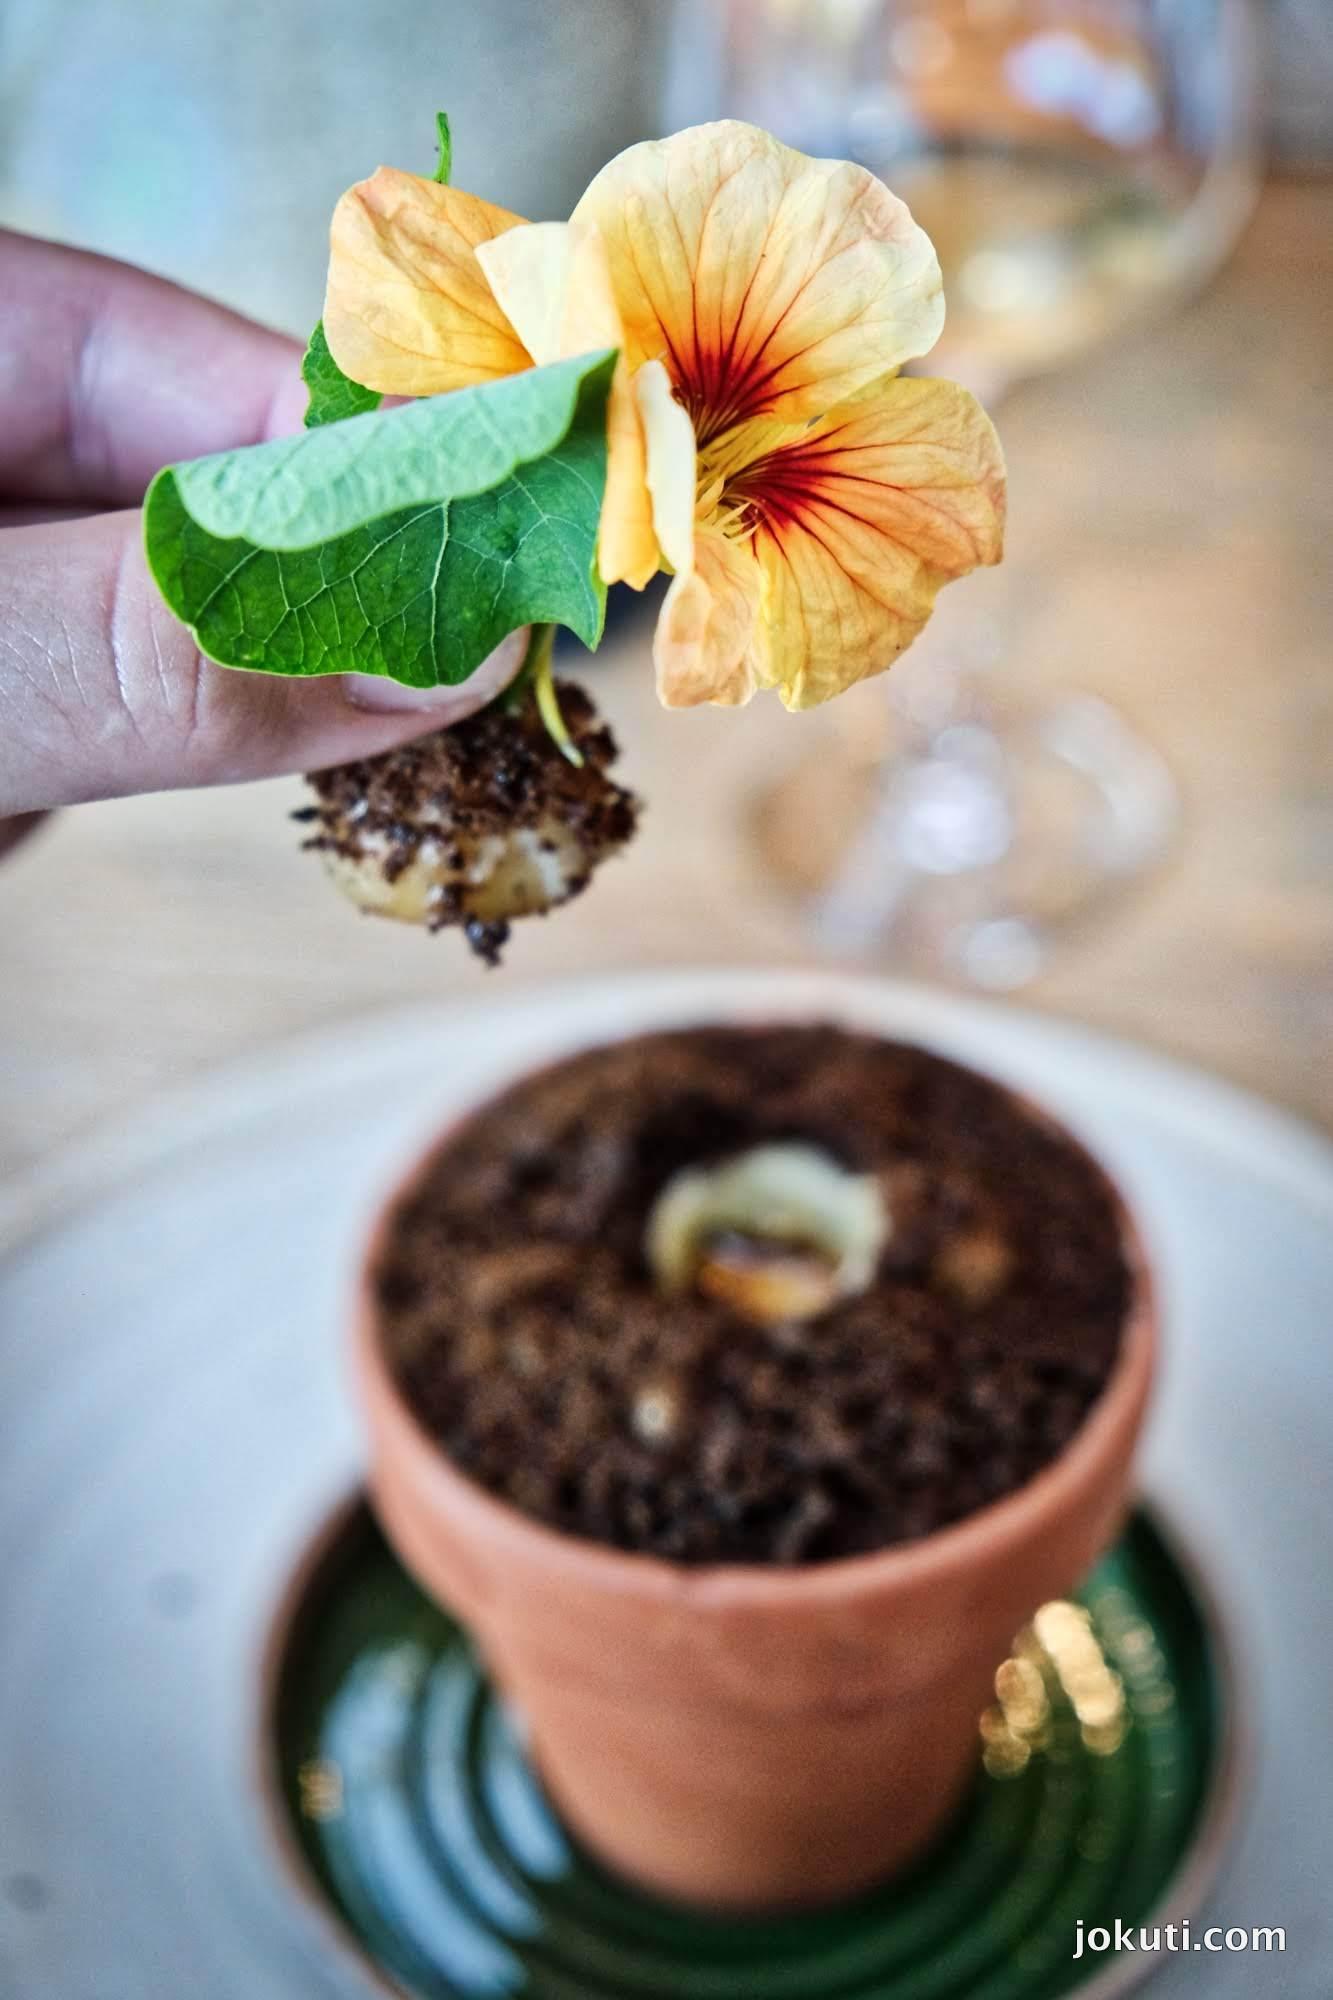 dscf6603_noma_copenhagen_vegeterian_plant_restaurant_redzepi_jokuti_vilagevo_l.jpg